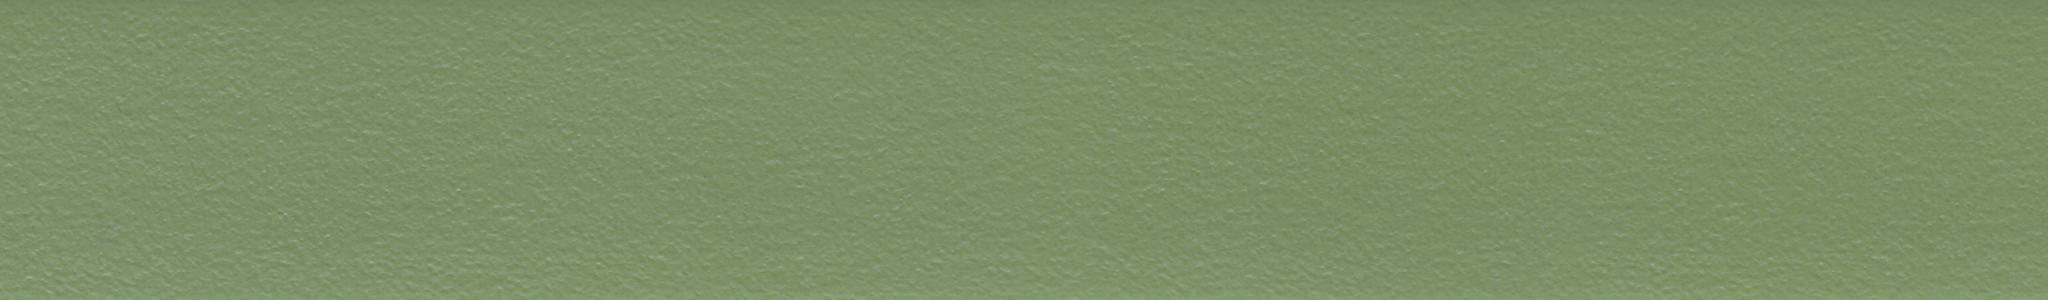 HU 160665 ABS Edge Green Soft Pearl 107